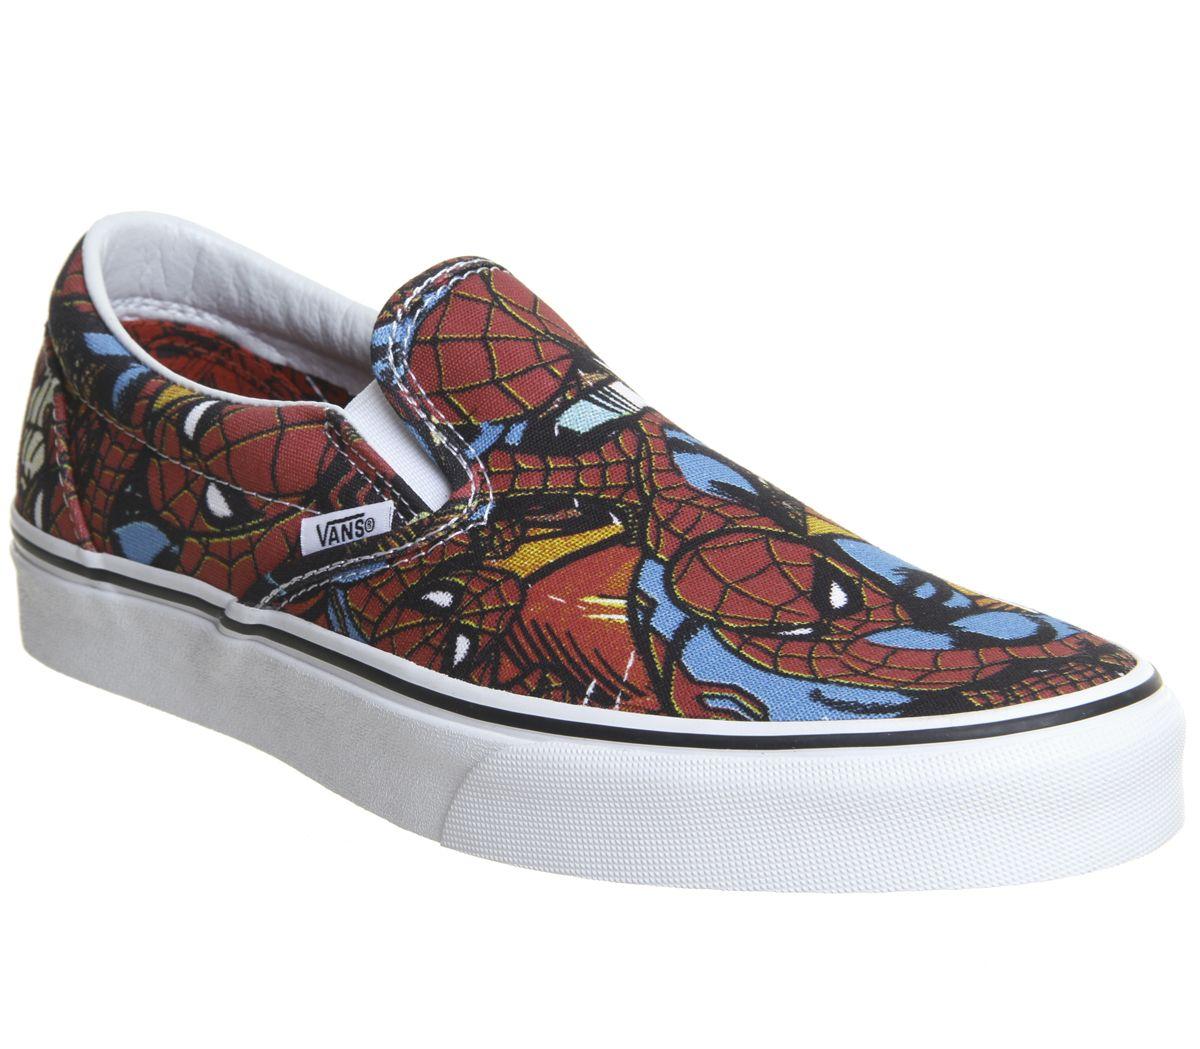 466bb816f4 Vans Vans Classic Slip On Trainers Spiderman Black Marvel - Unisex ...